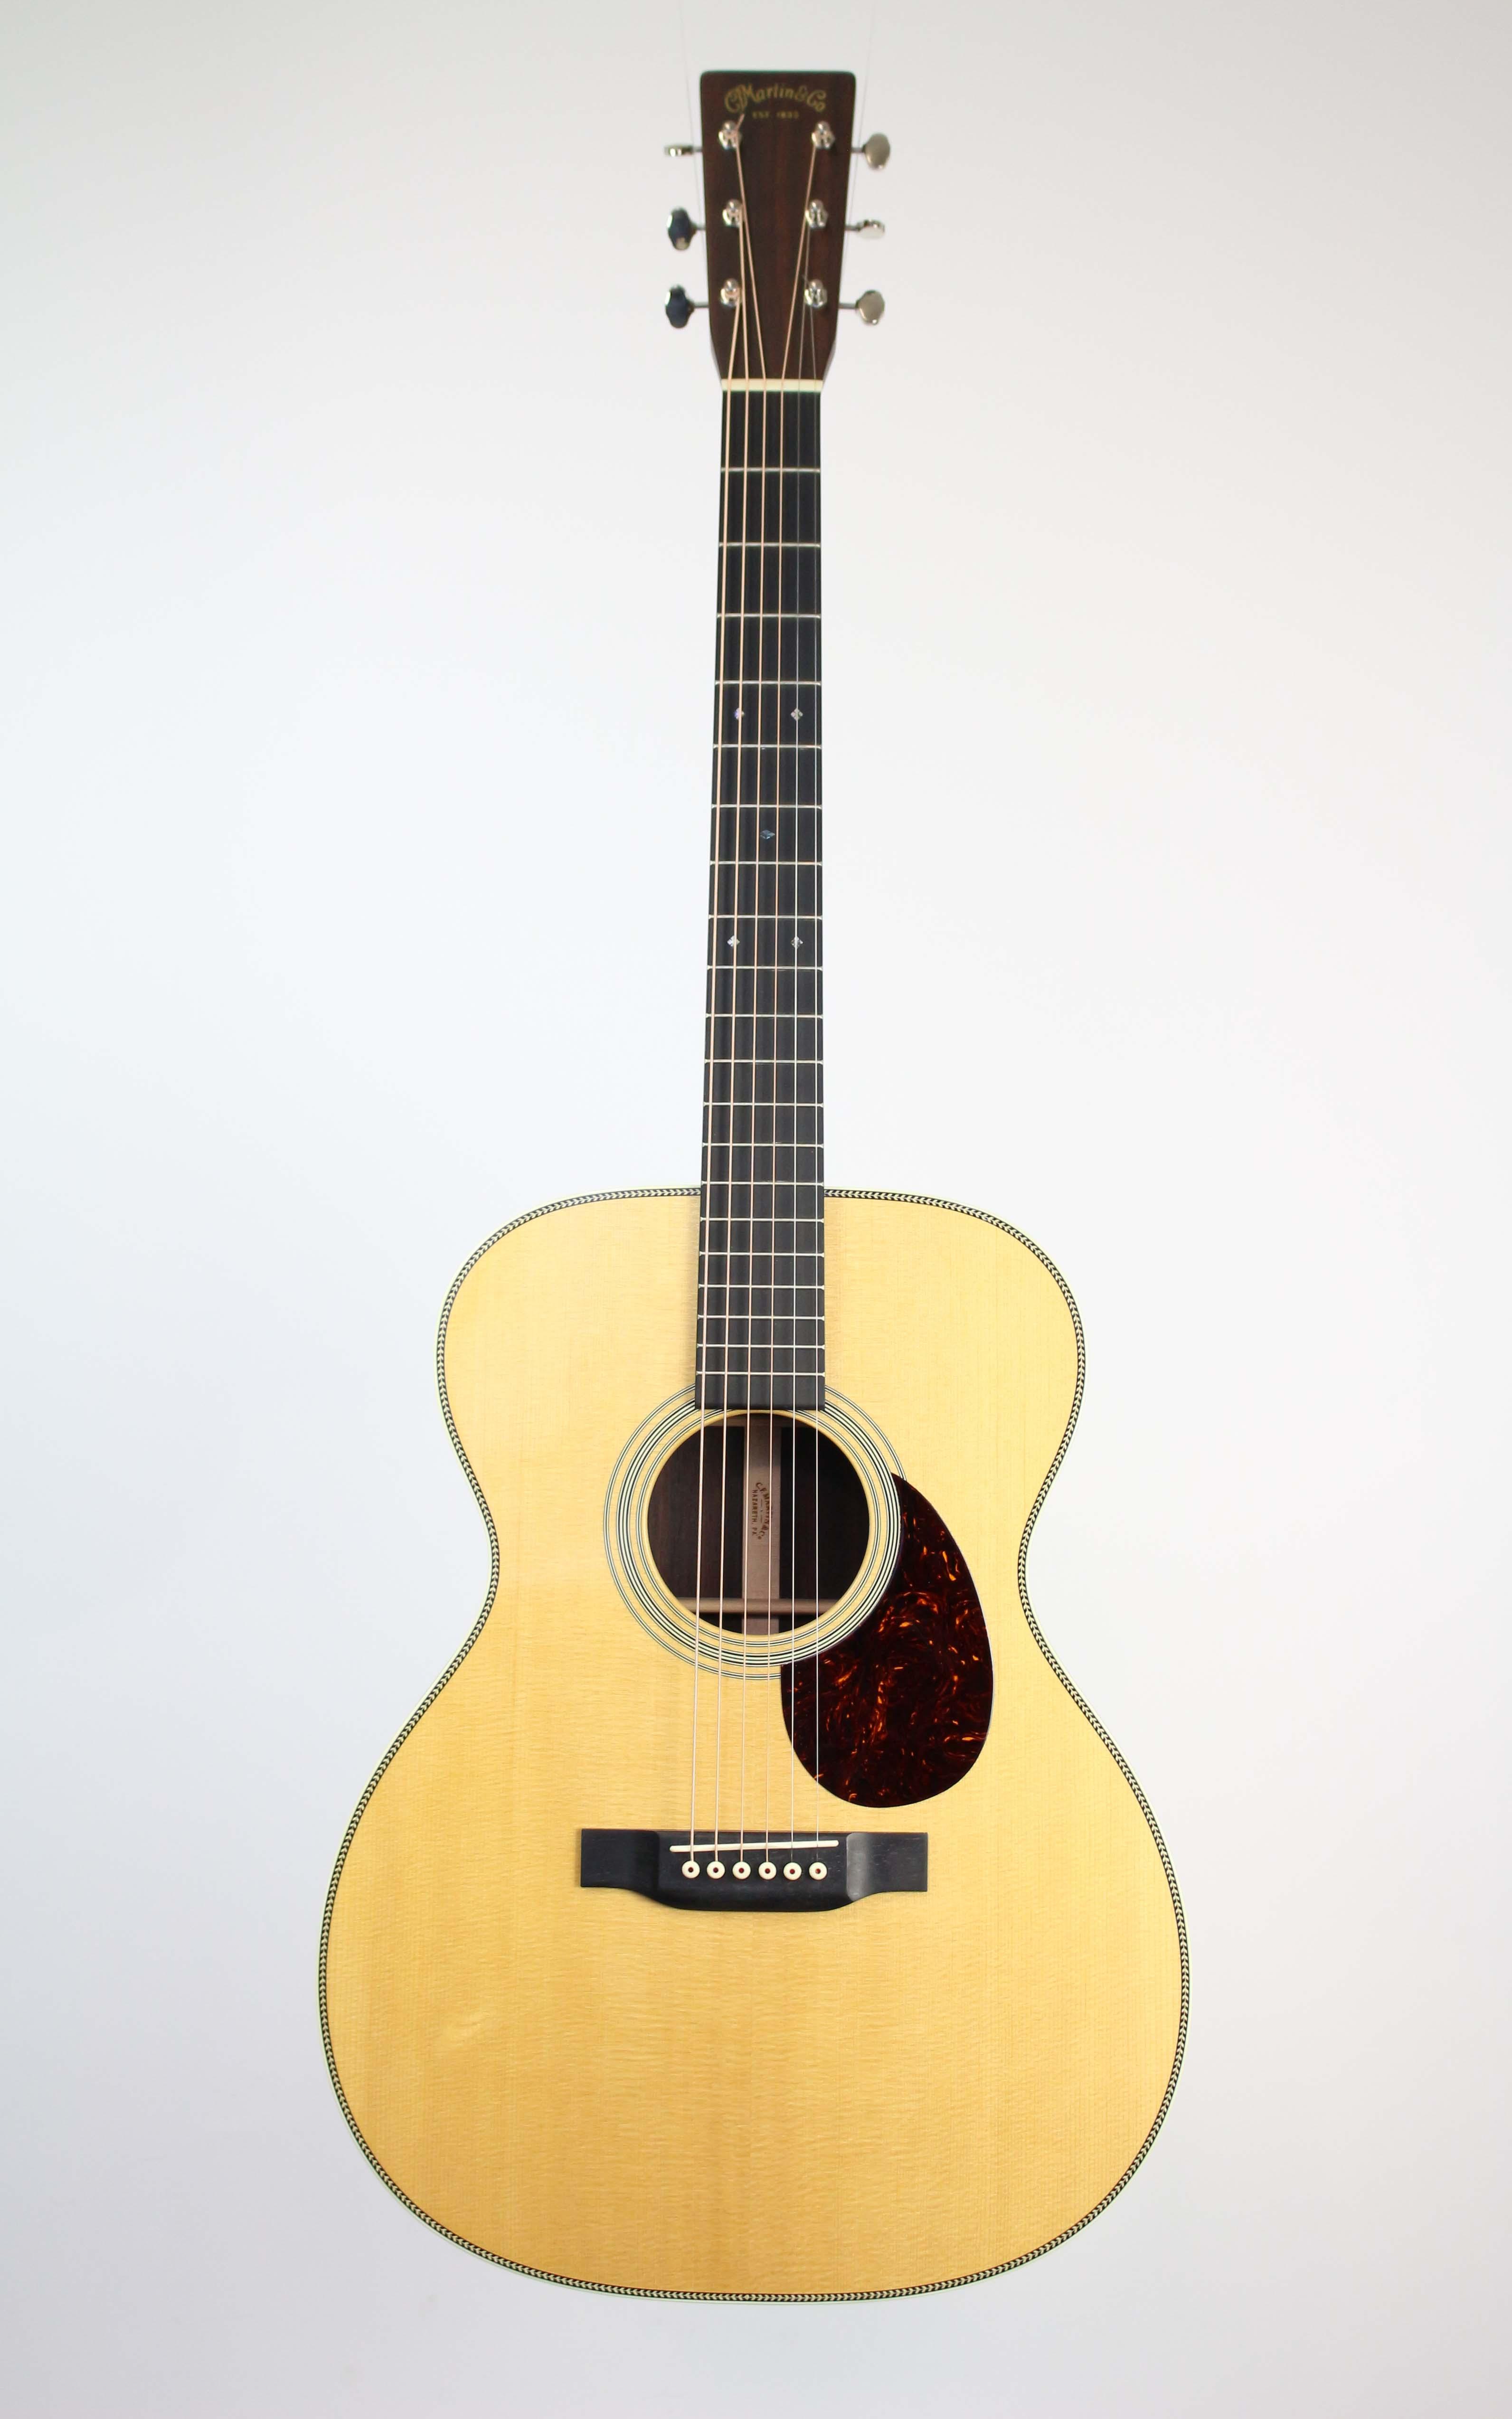 Martin - OM - 28 - Gitarren - Westerngitarren | MUSIK BERTRAM Deutschland Freiburg